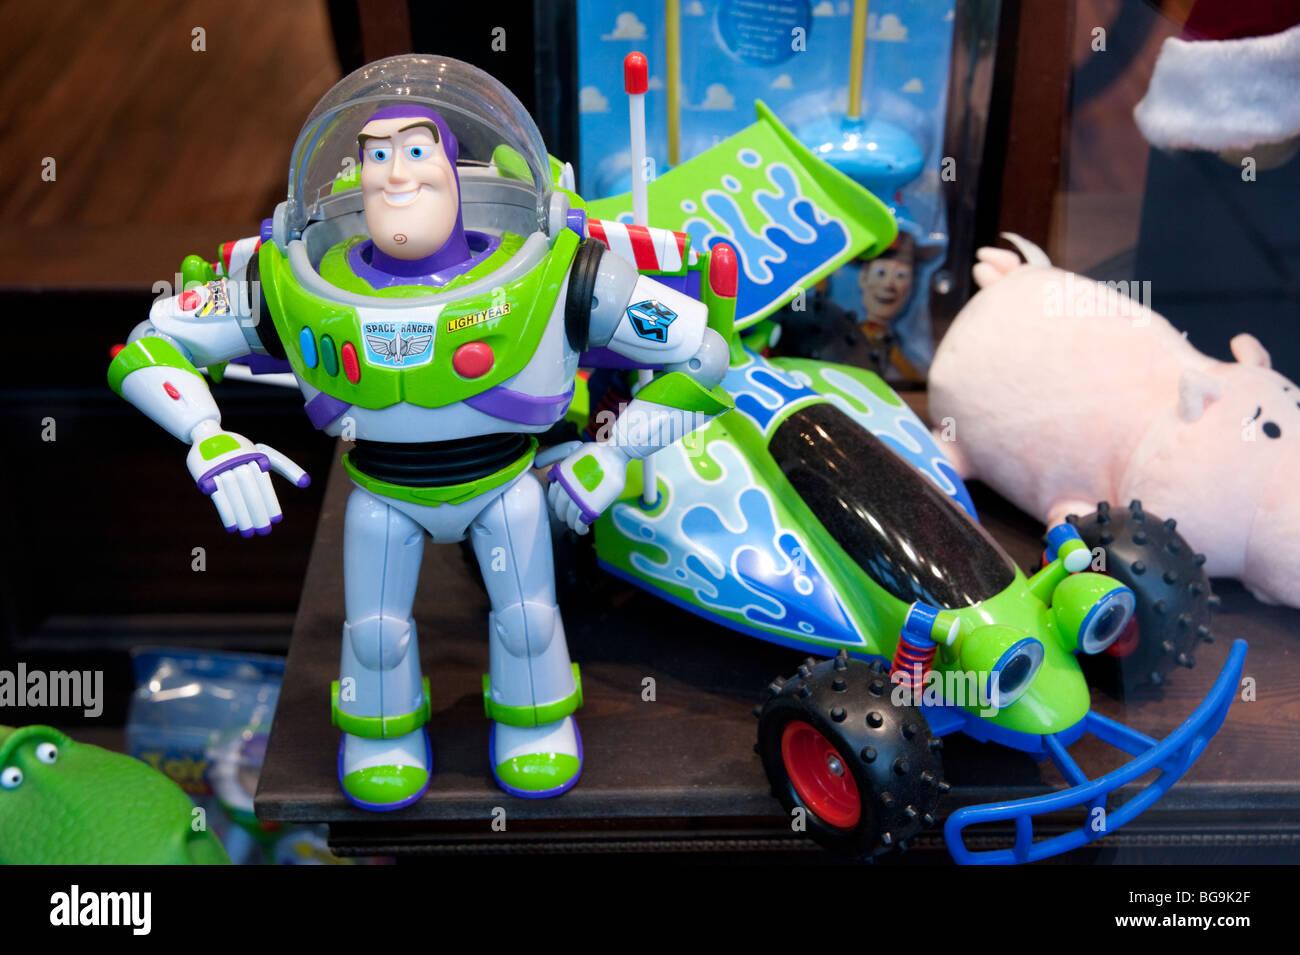 Buzz Lightyear jouets en vitrine, Angleterre, Grande-Bretagne, Royaume-Uni Photo Stock